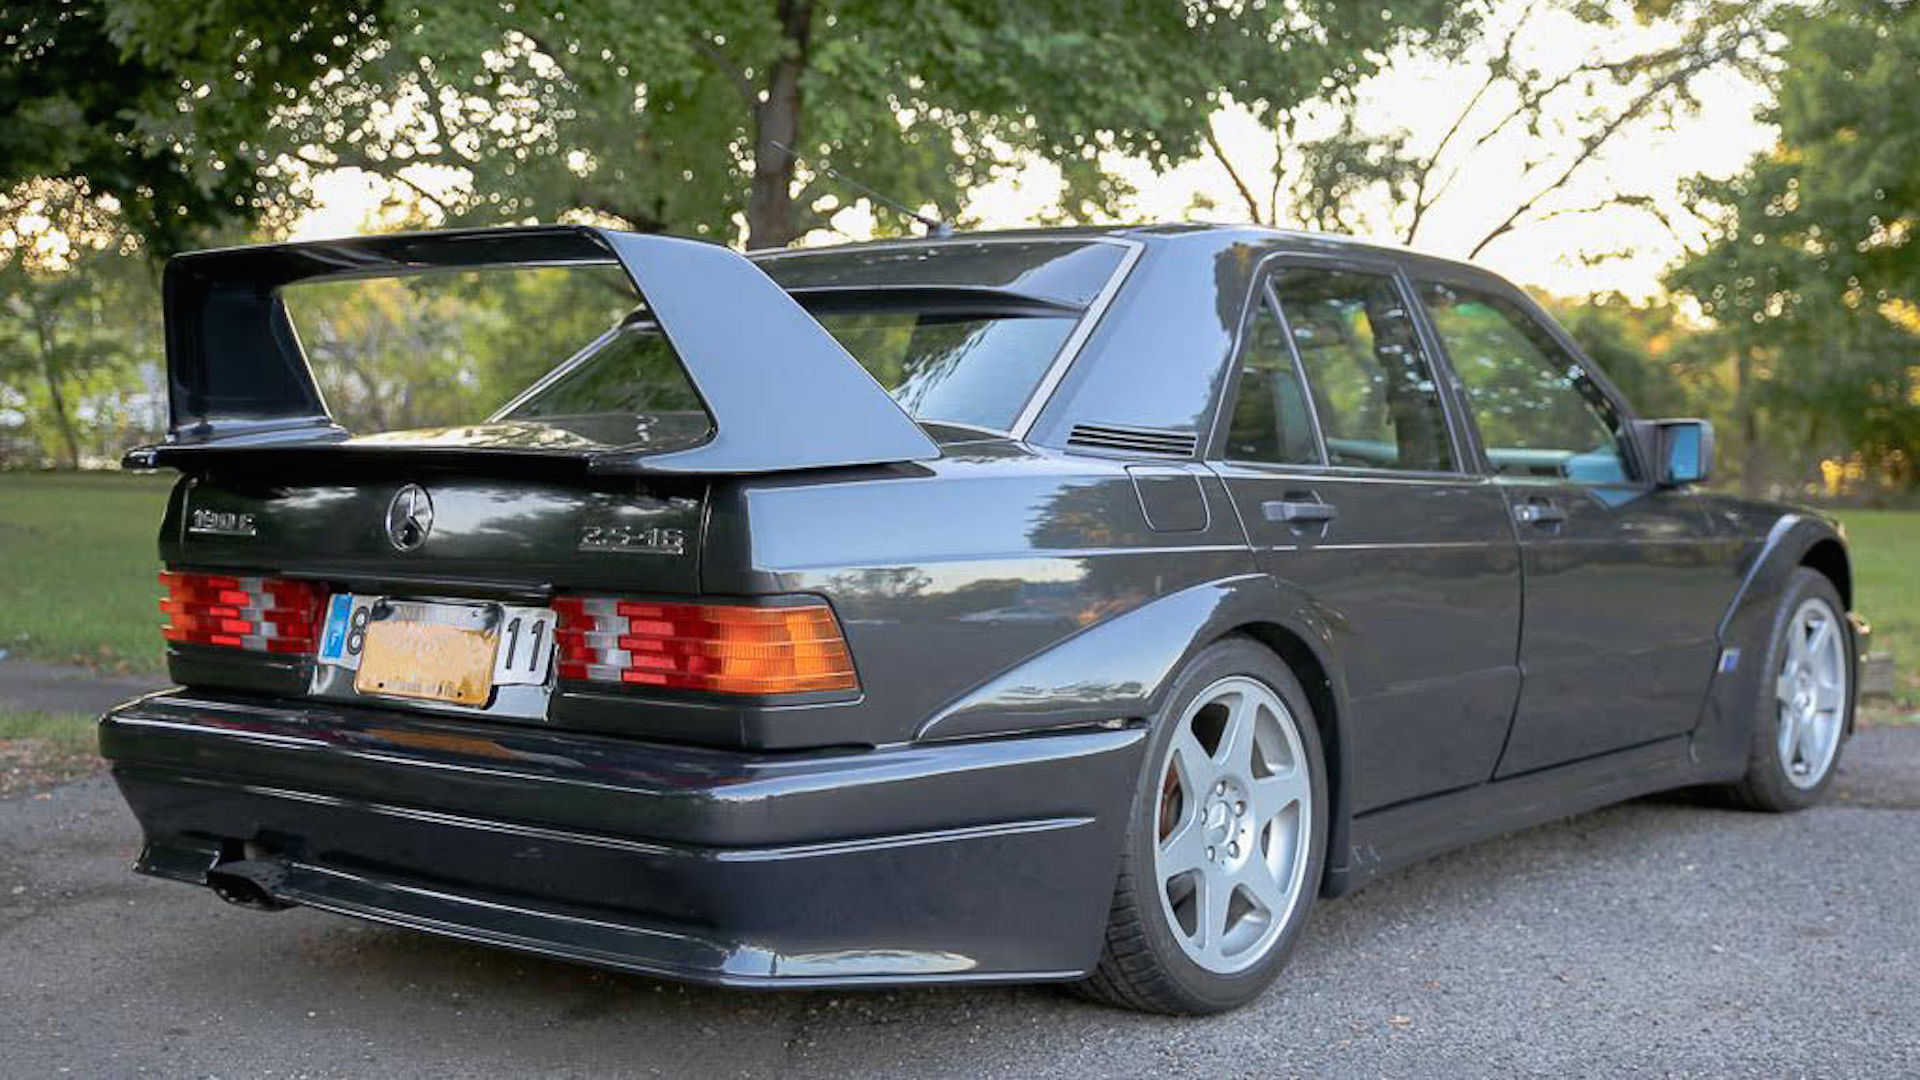 1990 Mercedes-Benz 190E Cosworth Evo II on eBay with 29,000